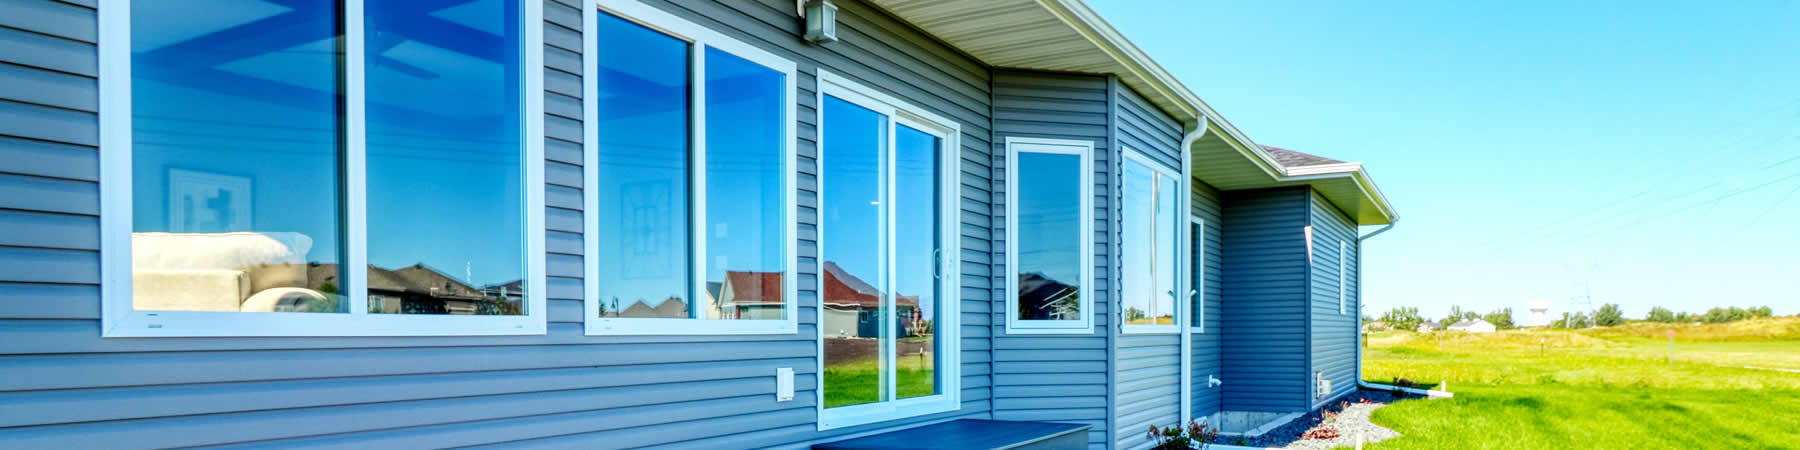 Equity Home Builders, LLC - Header Banner